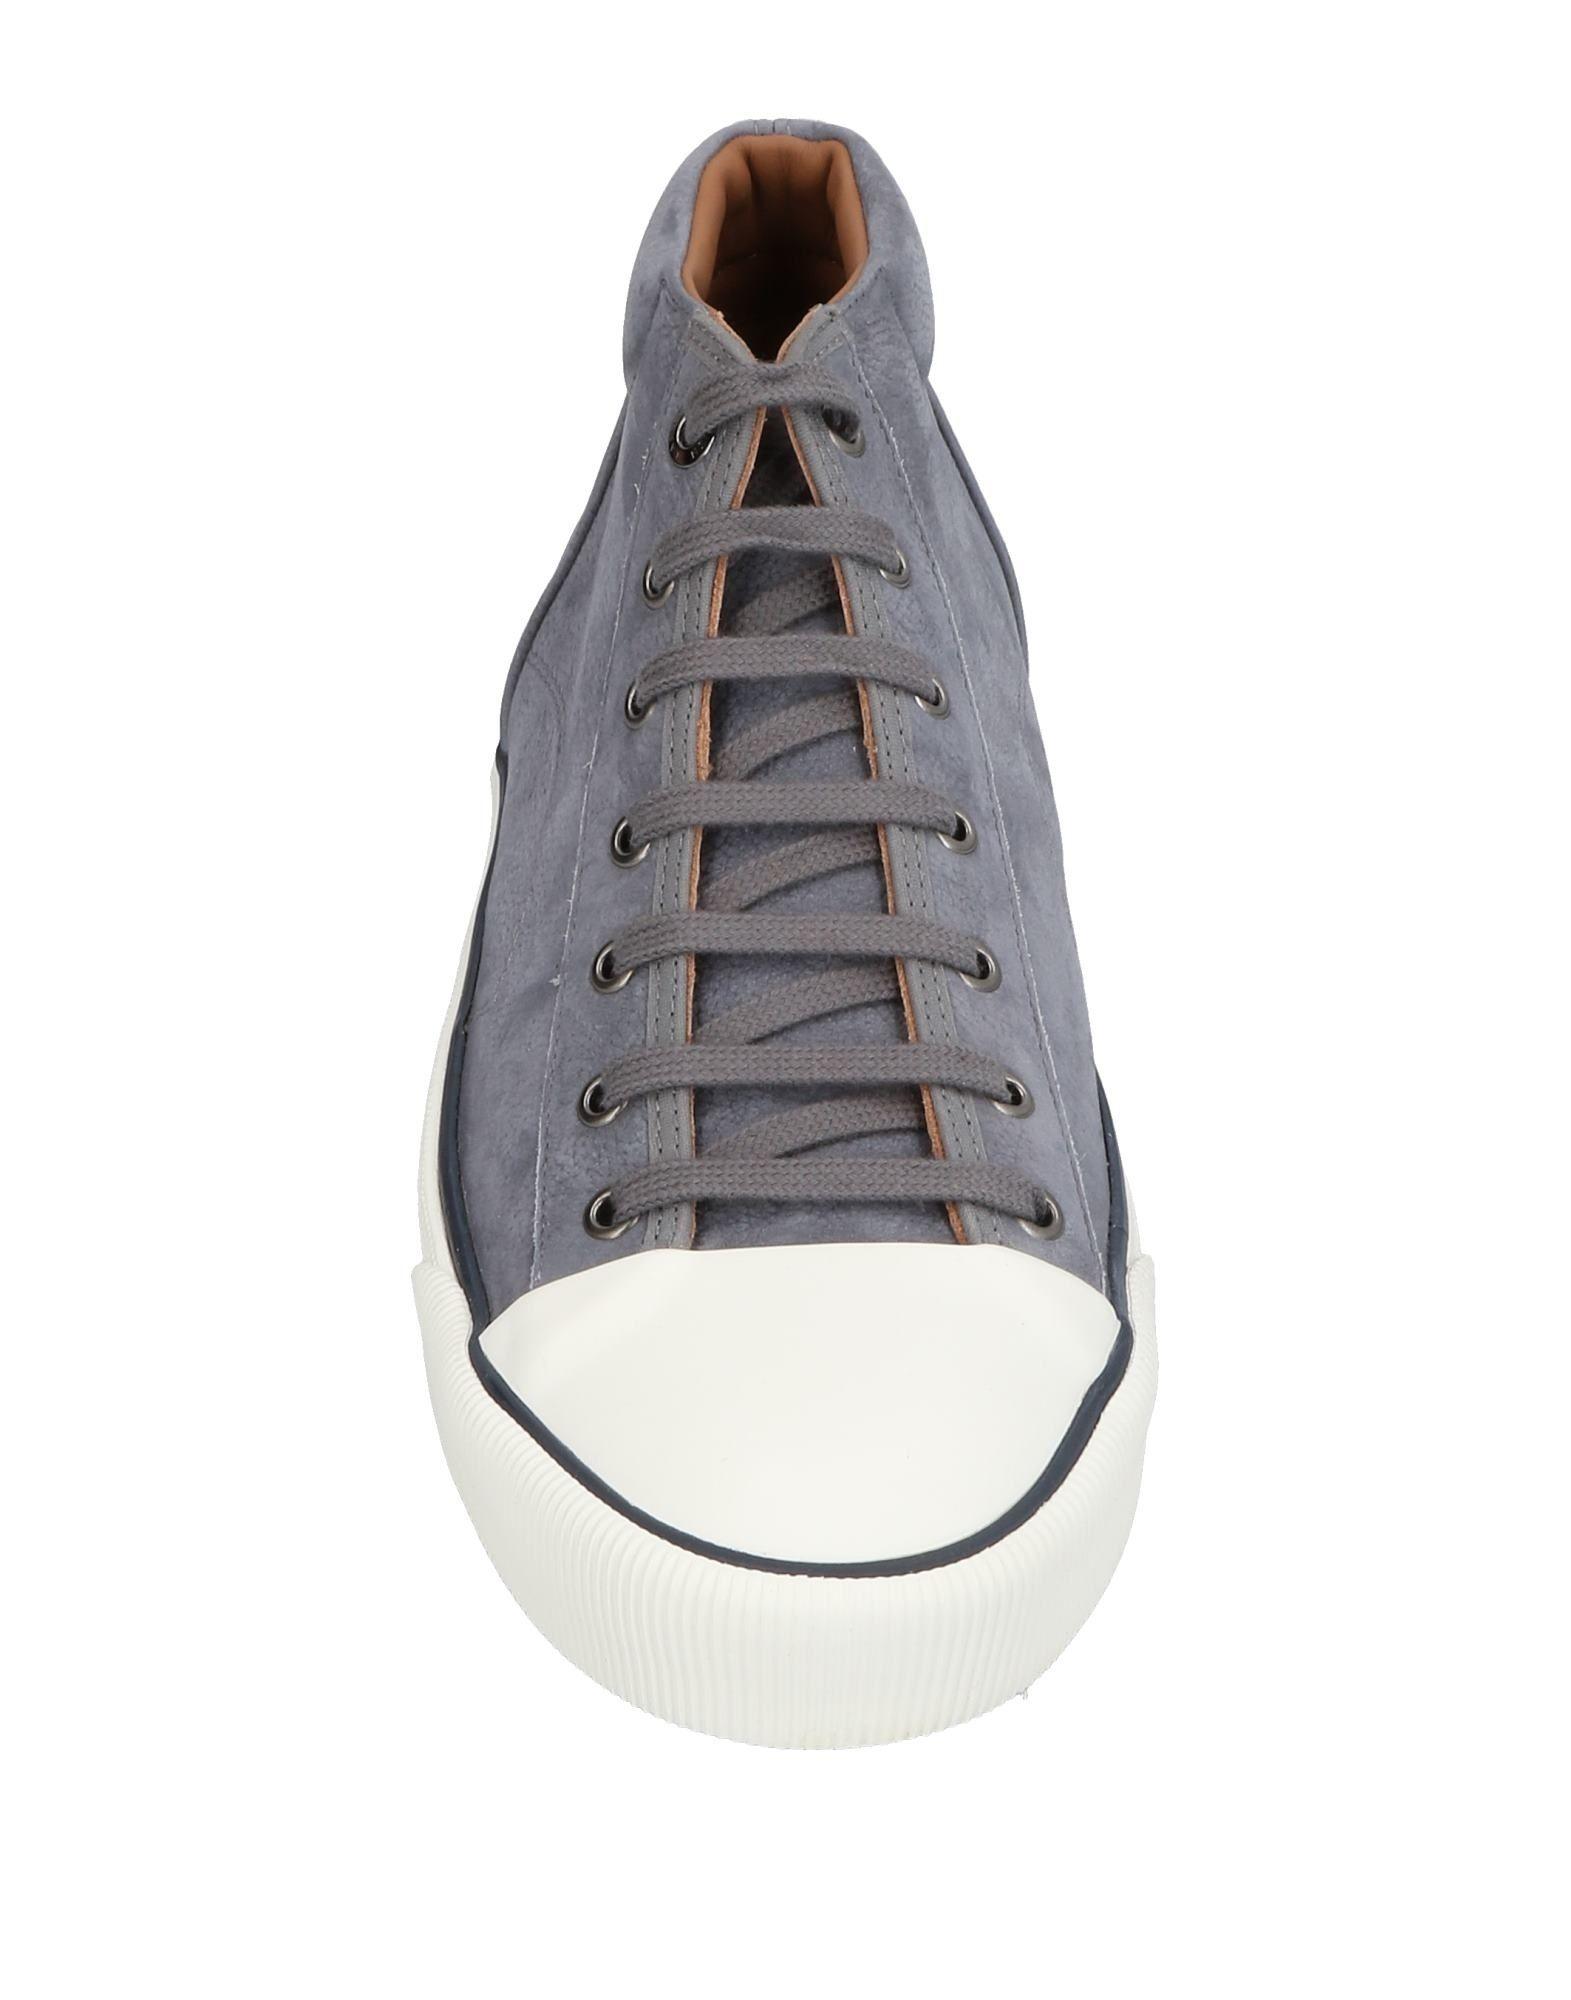 Lanvin Sneakers Sneakers Sneakers - Men Lanvin Sneakers online on  Australia - 11216502GU b2a158